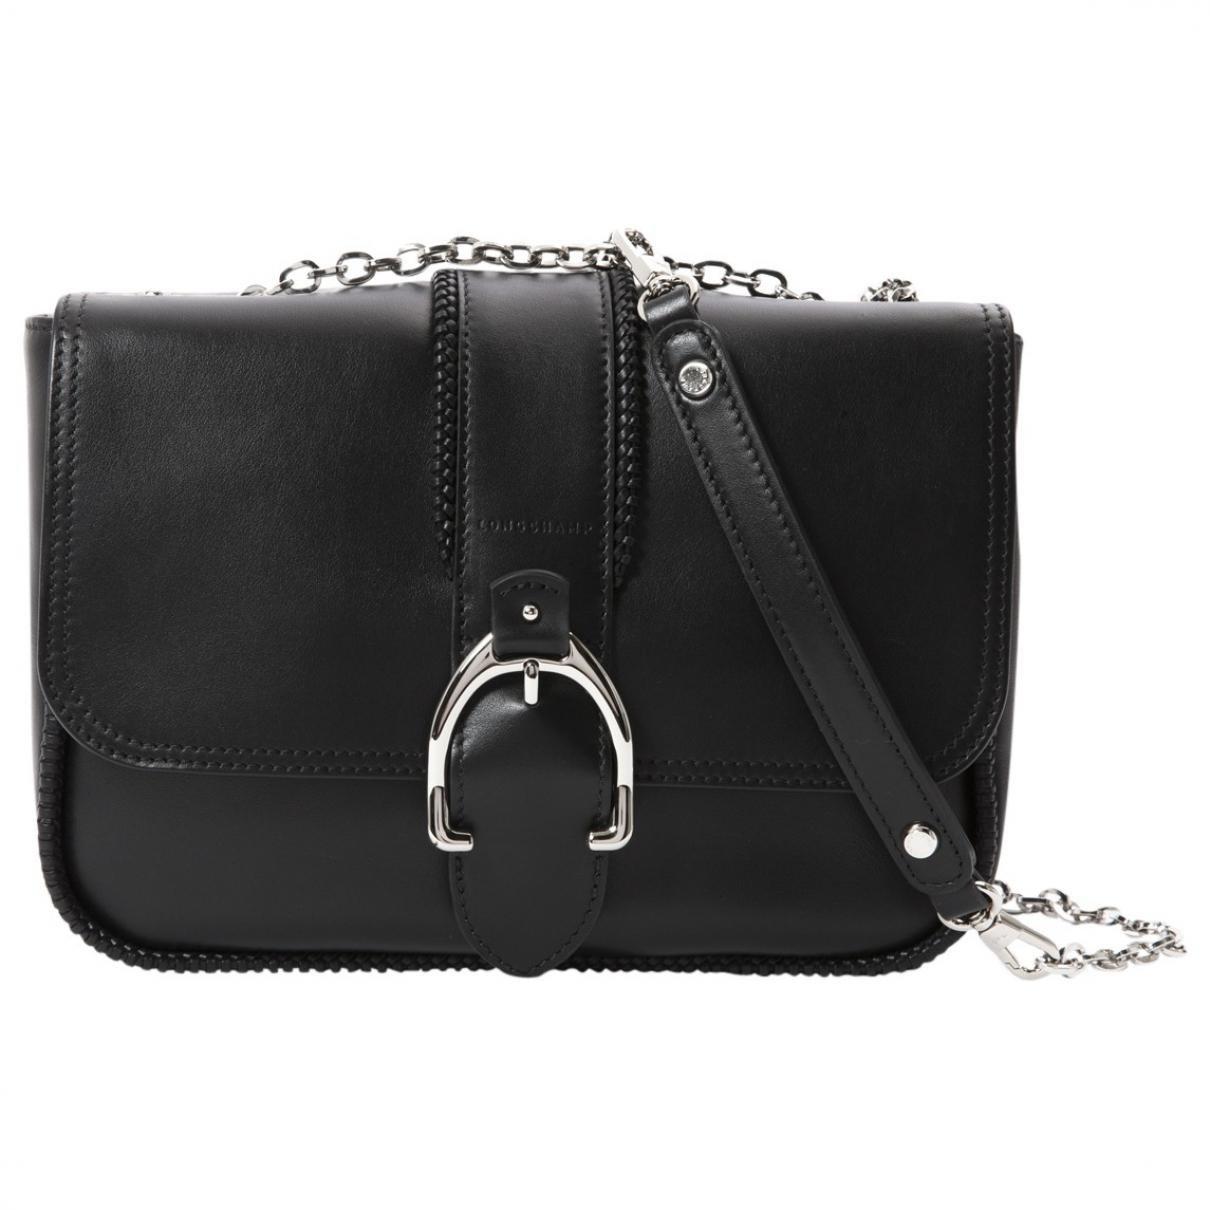 435a28cbb2e Longchamp Balzane Leather Handbag in Black - Lyst